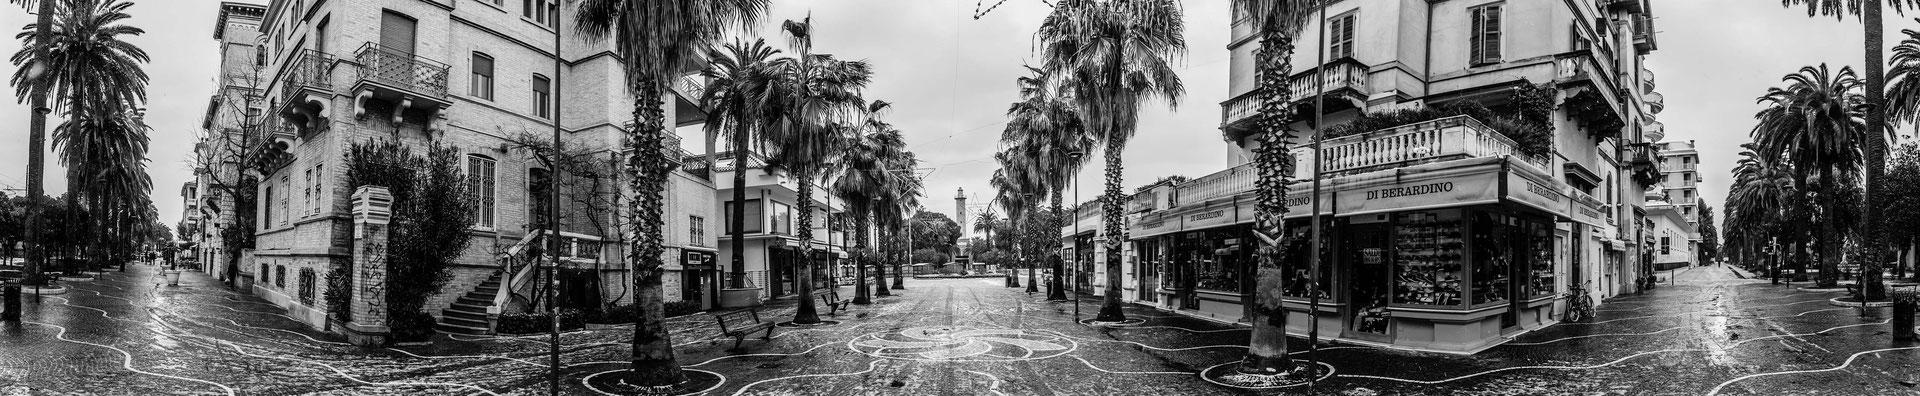 San Benedetto del Tronto. © Luca Cameli Photographer